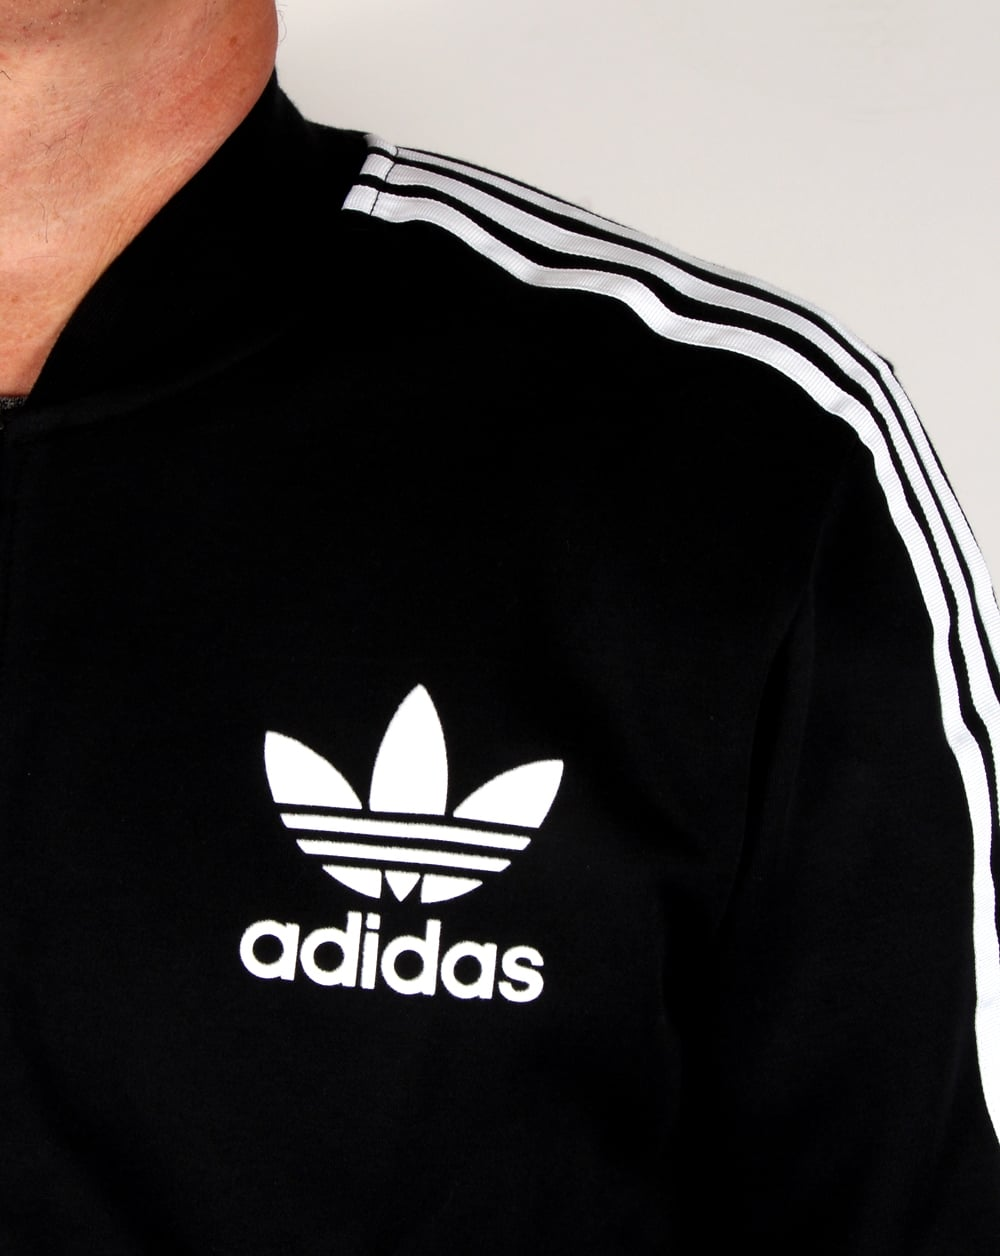 Adidas Superstar Jakke Stor nqprhOm3